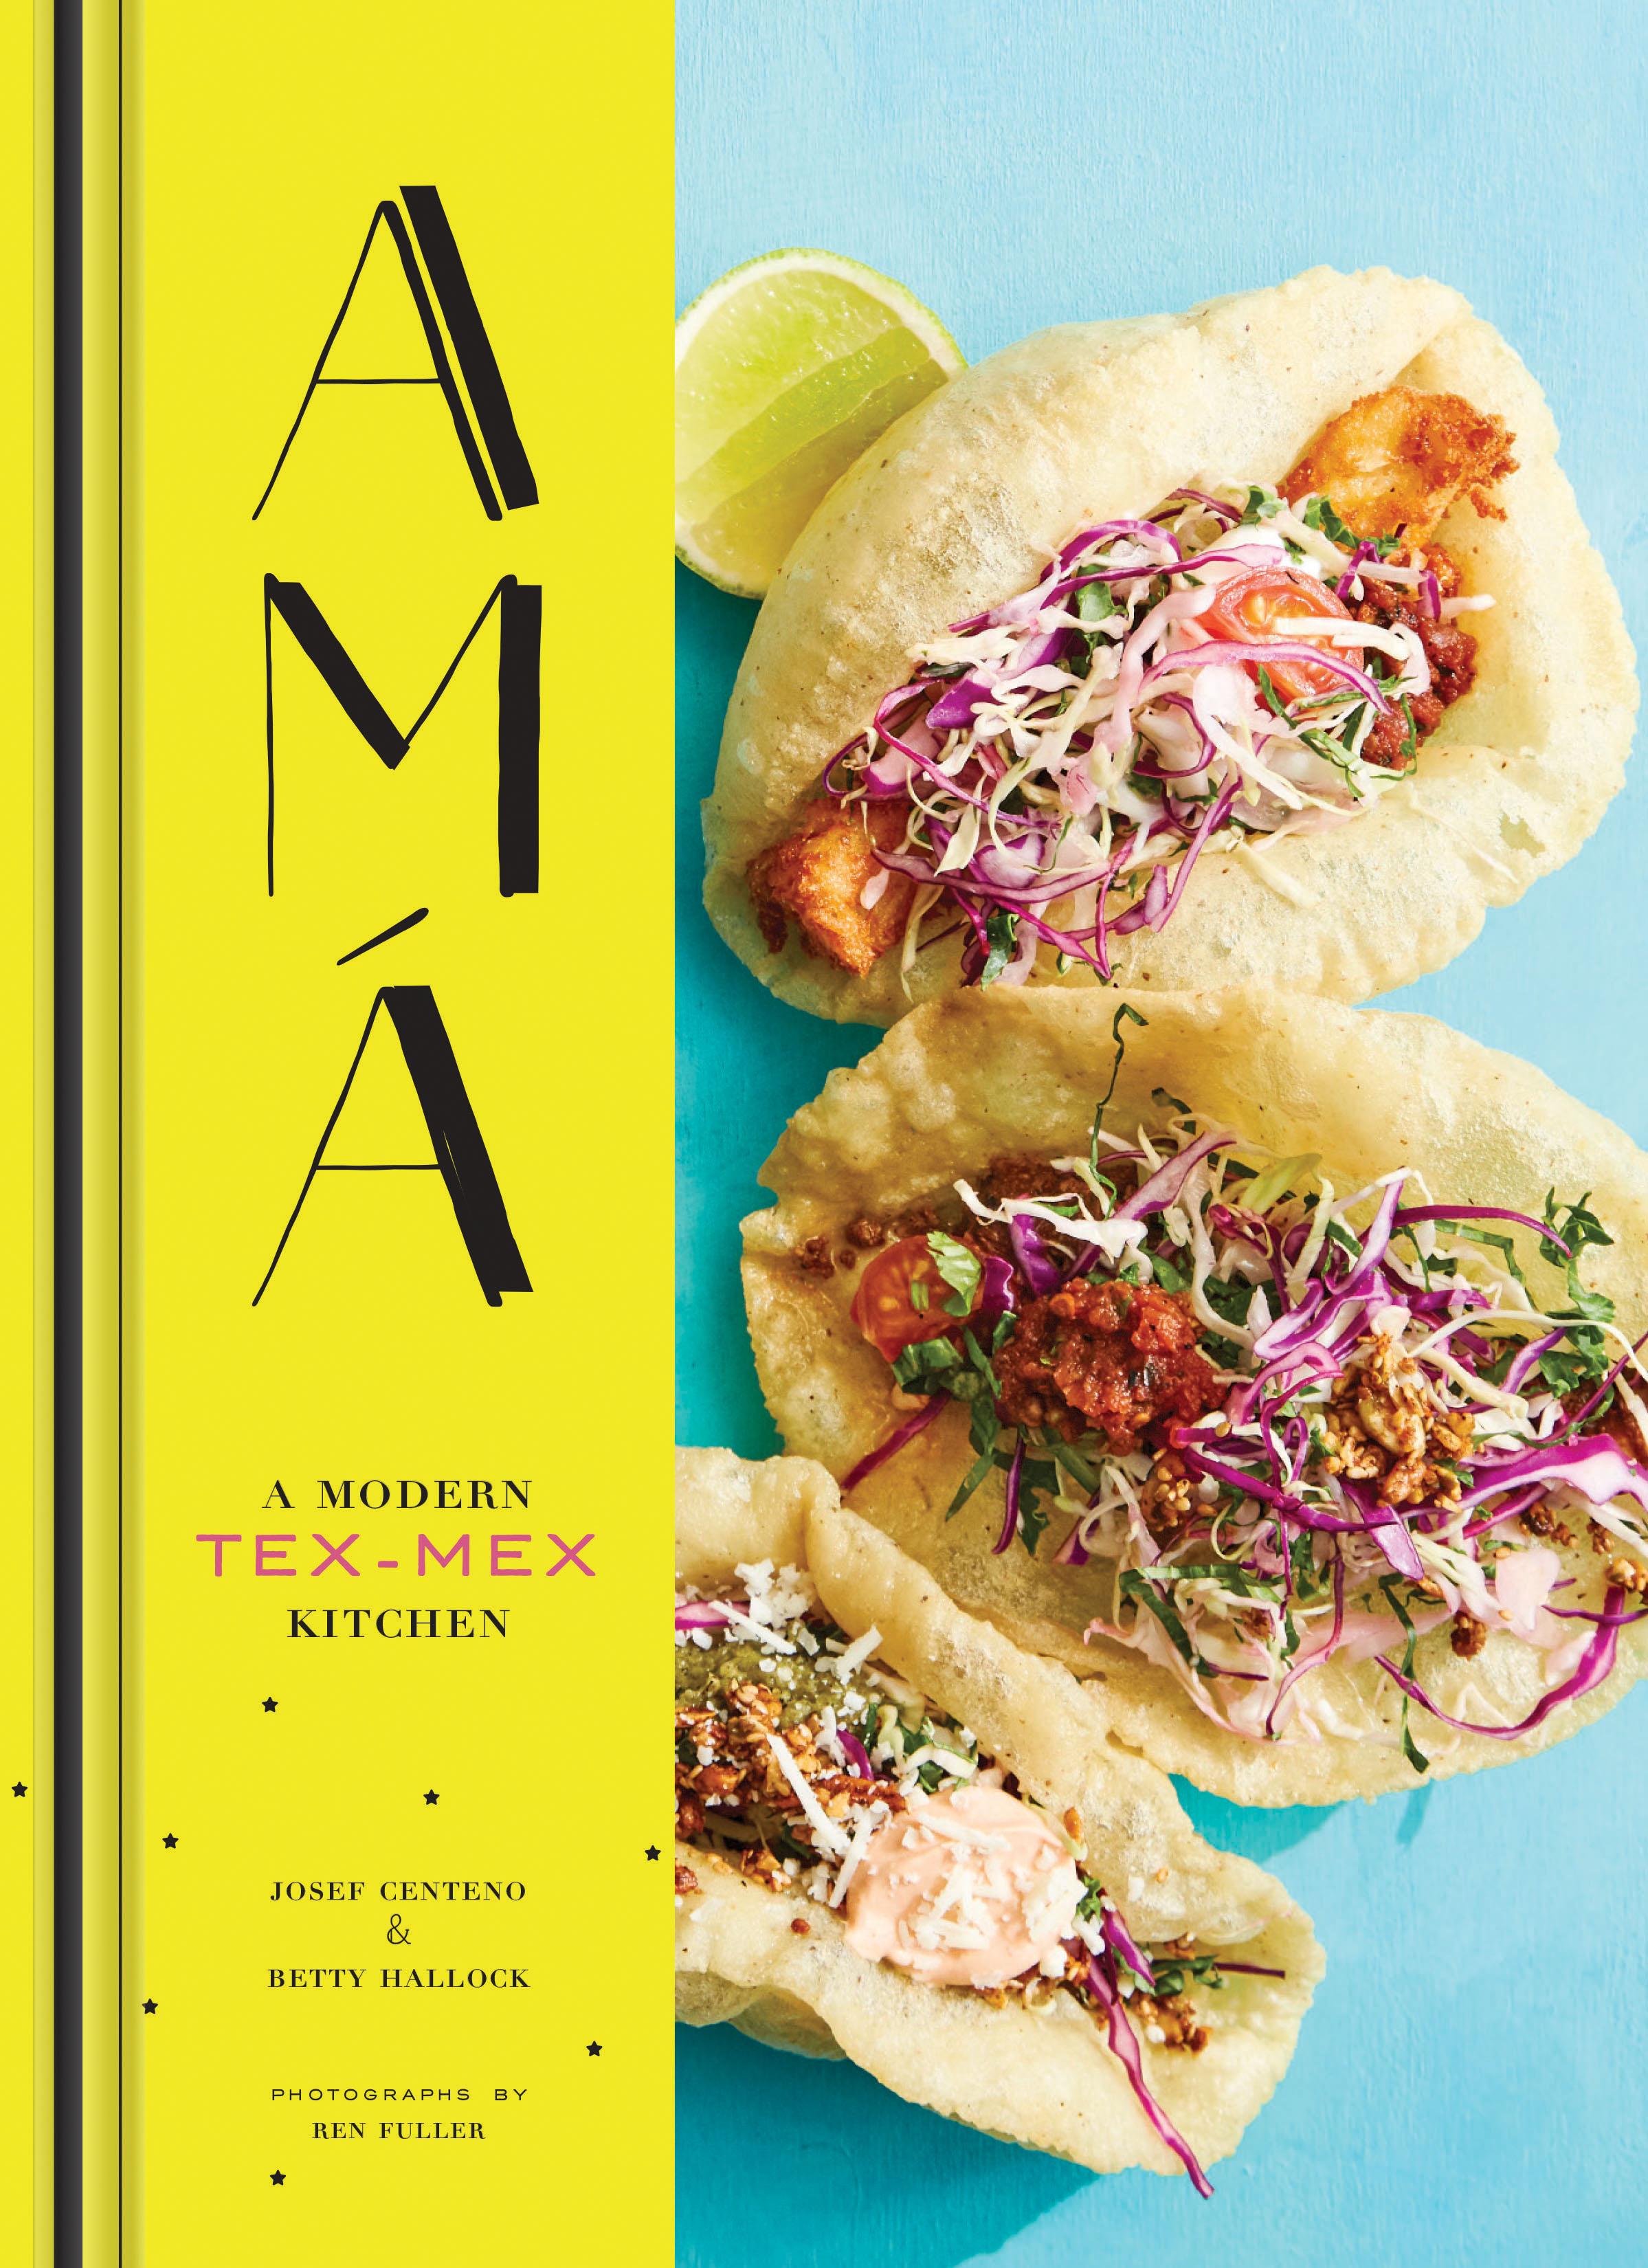 New cookbook! Amá: A Modern Tex-Mex Kitchen by Josef Centeno & Betty Hallock